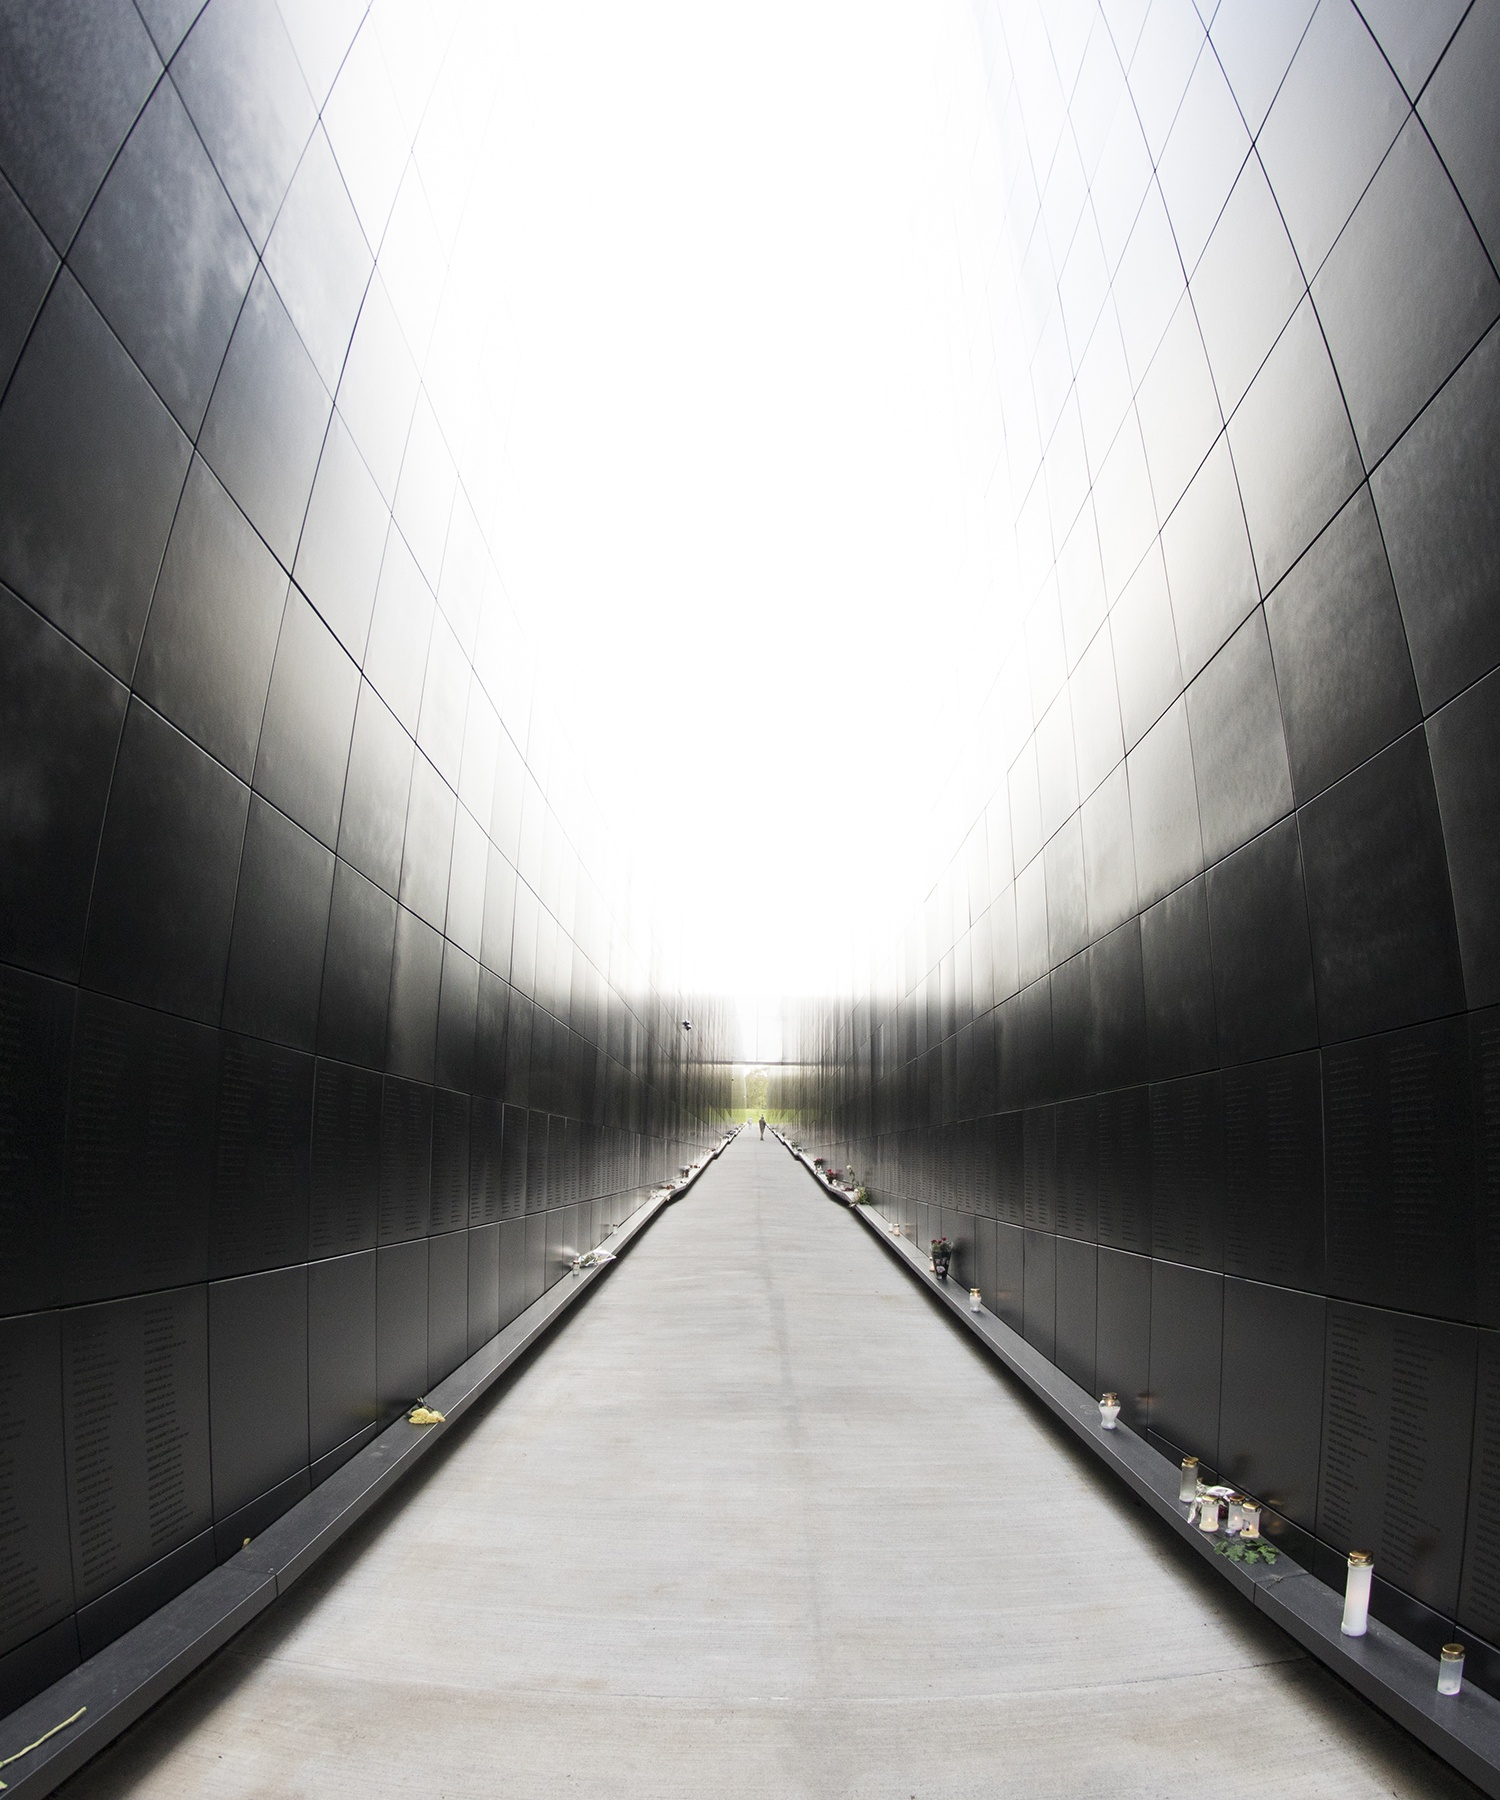 Memorial for communism victims in Tallinn, Estonia